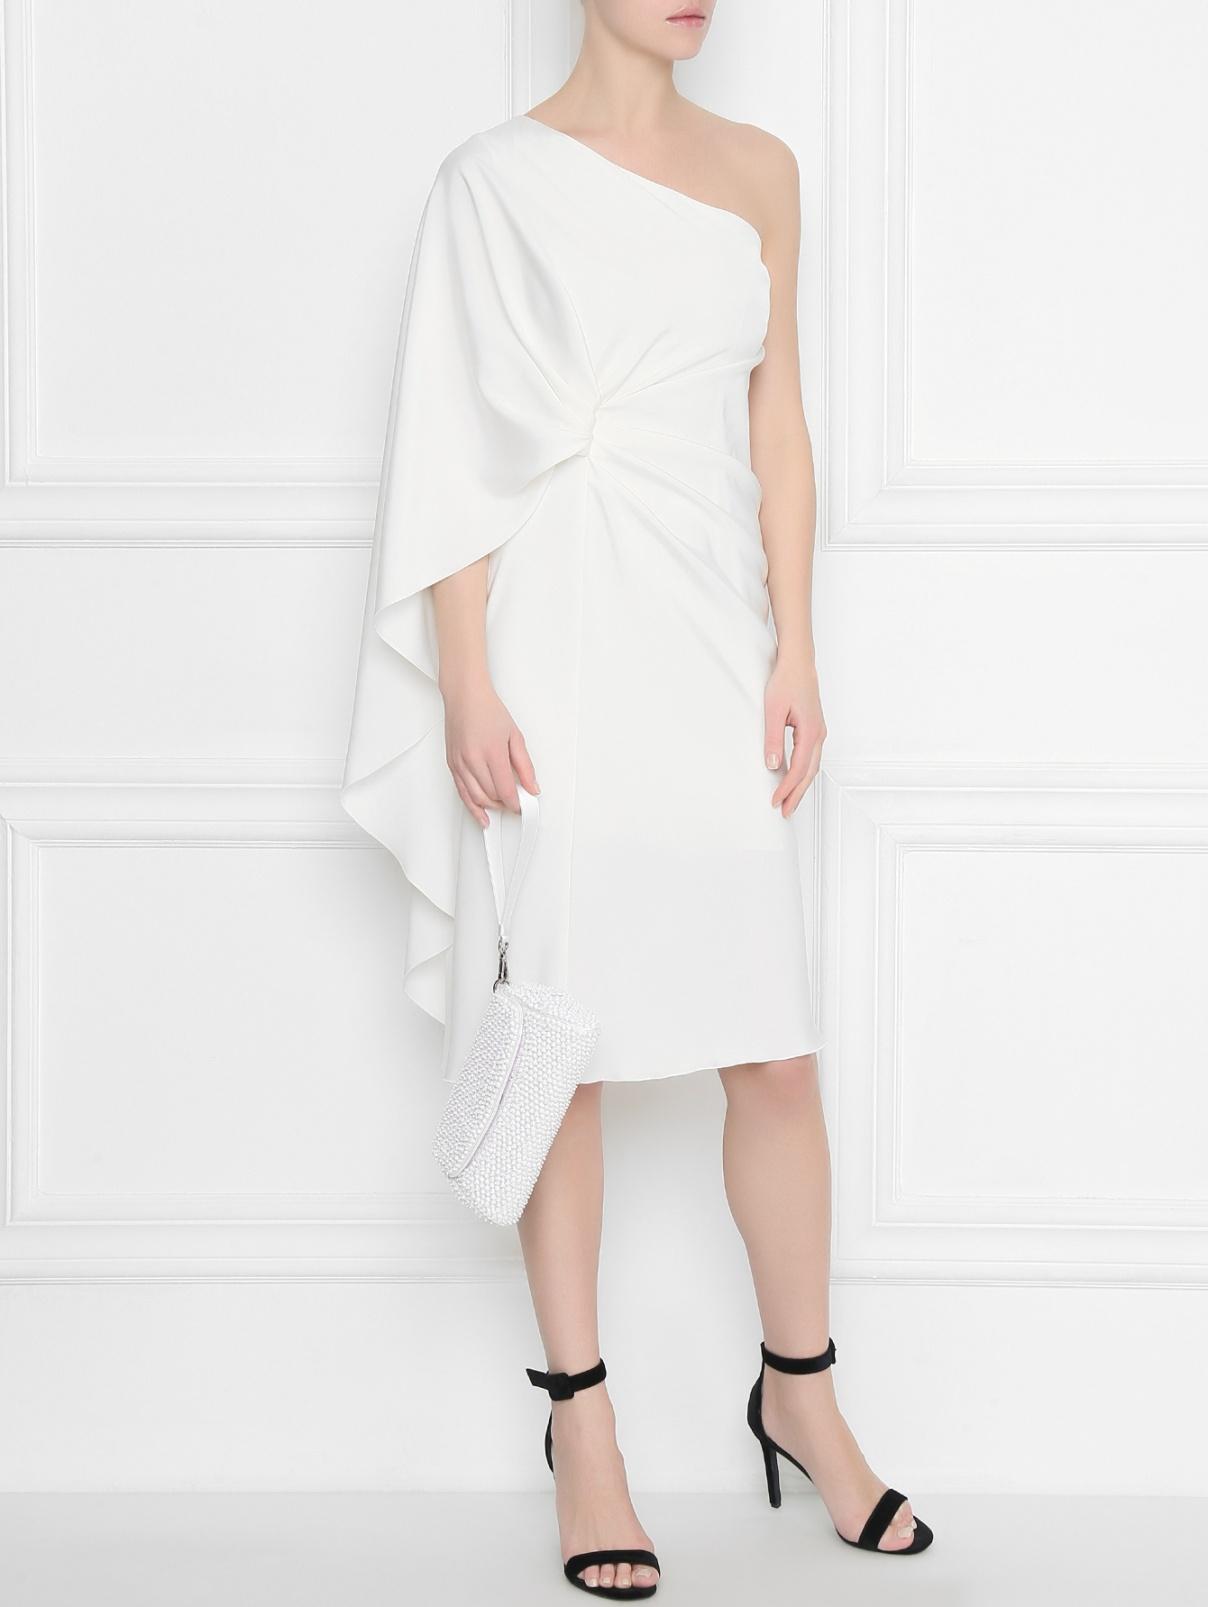 Платье ассиметричное со складкой Alberta Ferretti  –  Общий вид